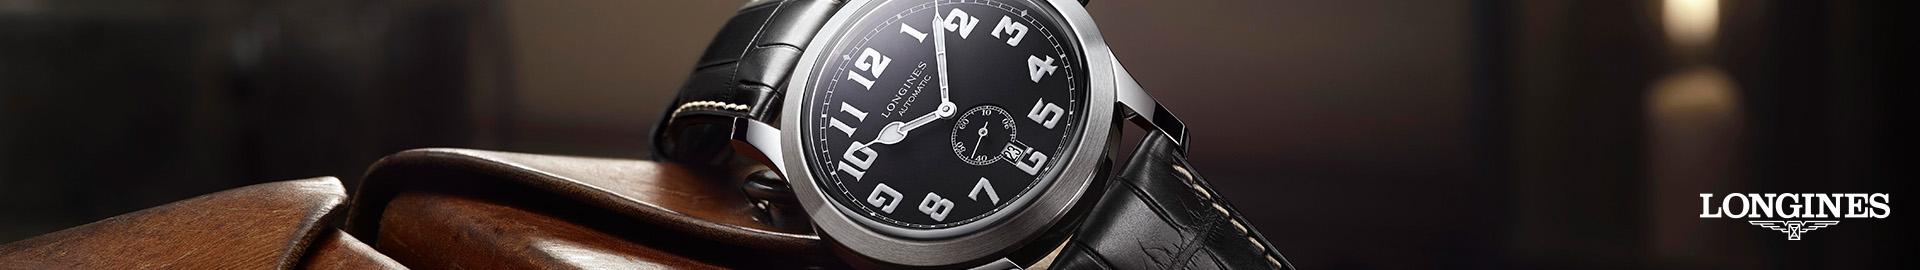 Longines men's watches Zazare Diamonds